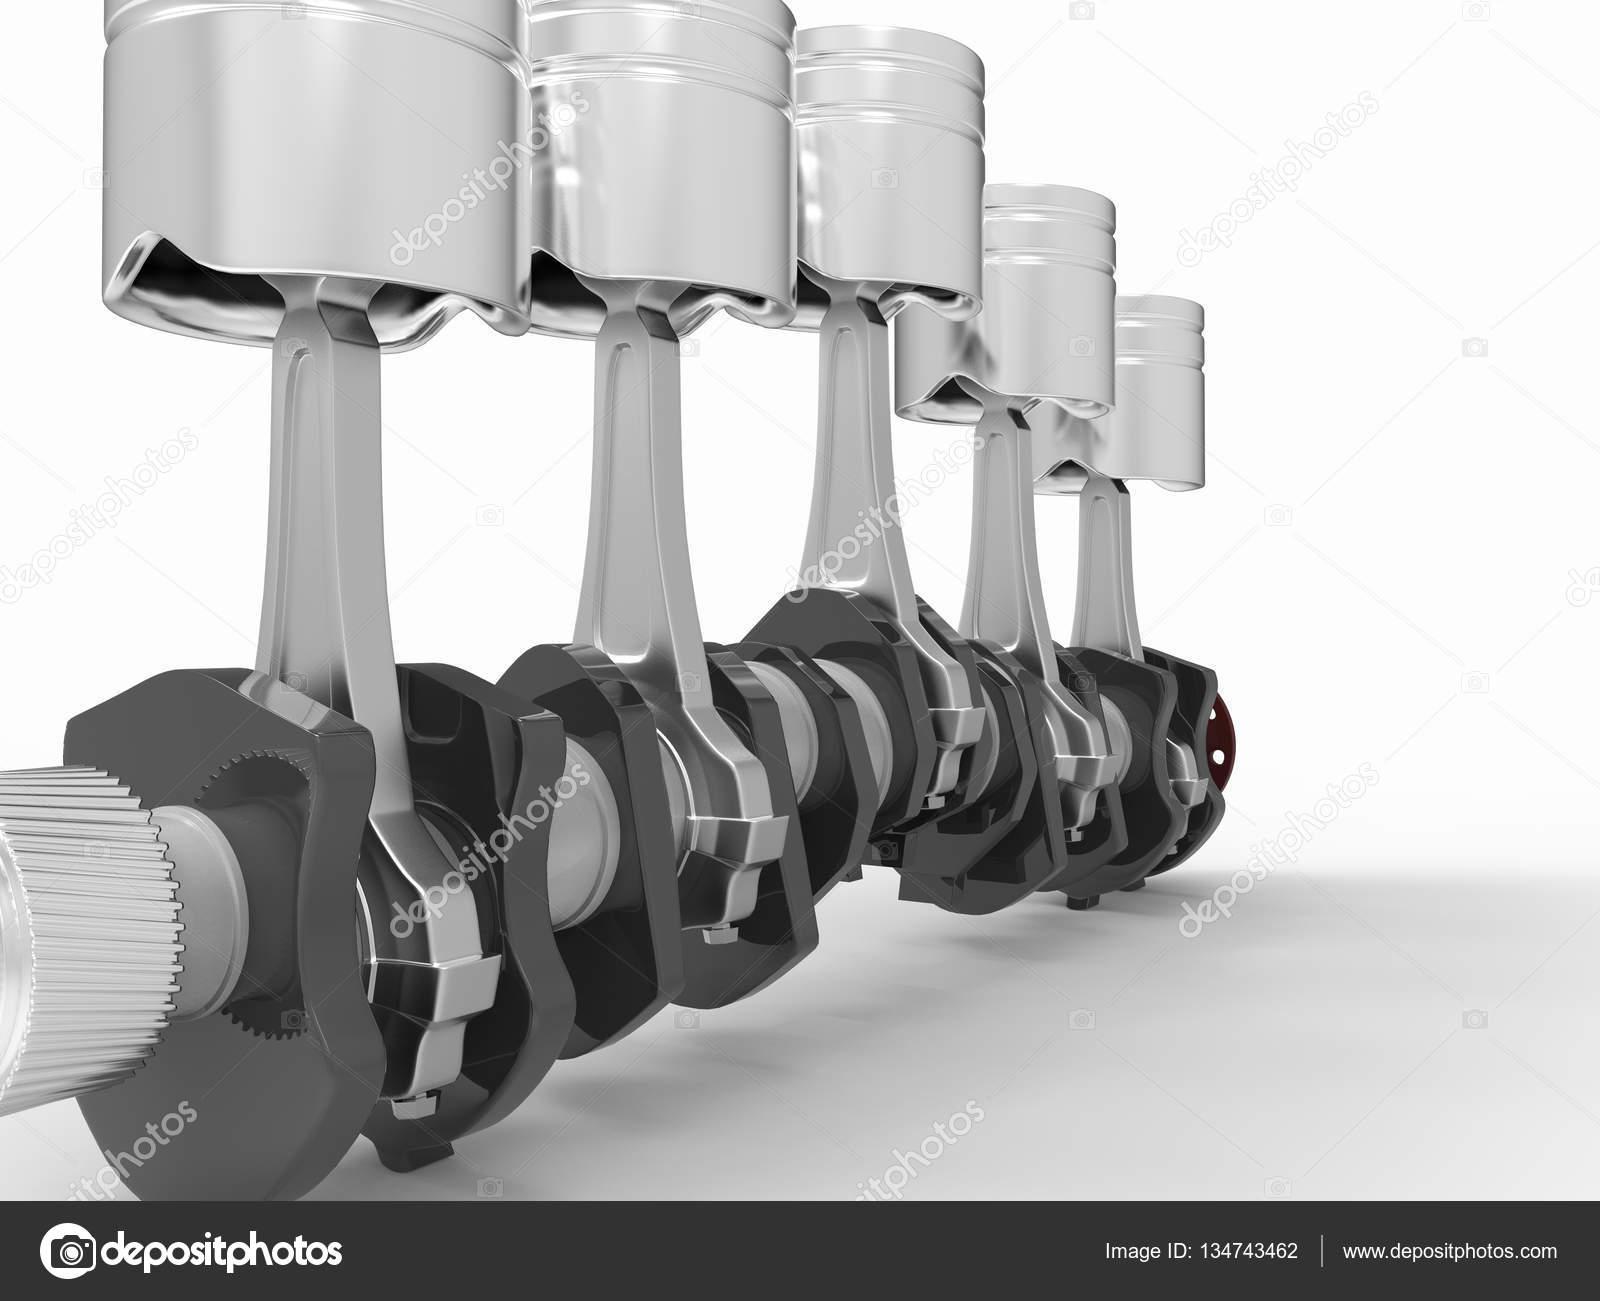 Kolben und Kurbelwelle — Stockfoto © andrija.pajtic@gmail.com #134743462